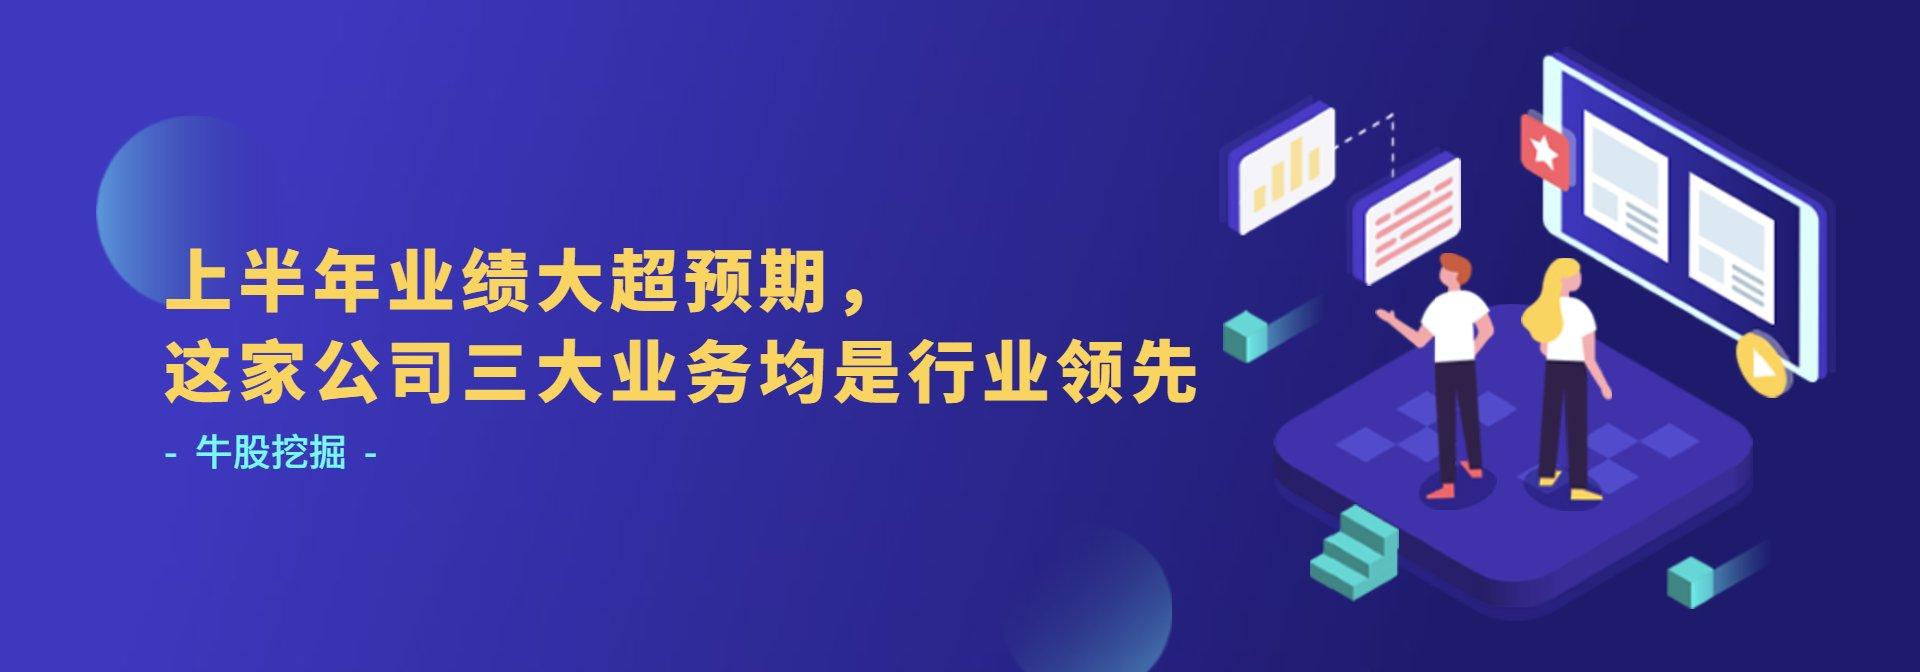 会员首页banner